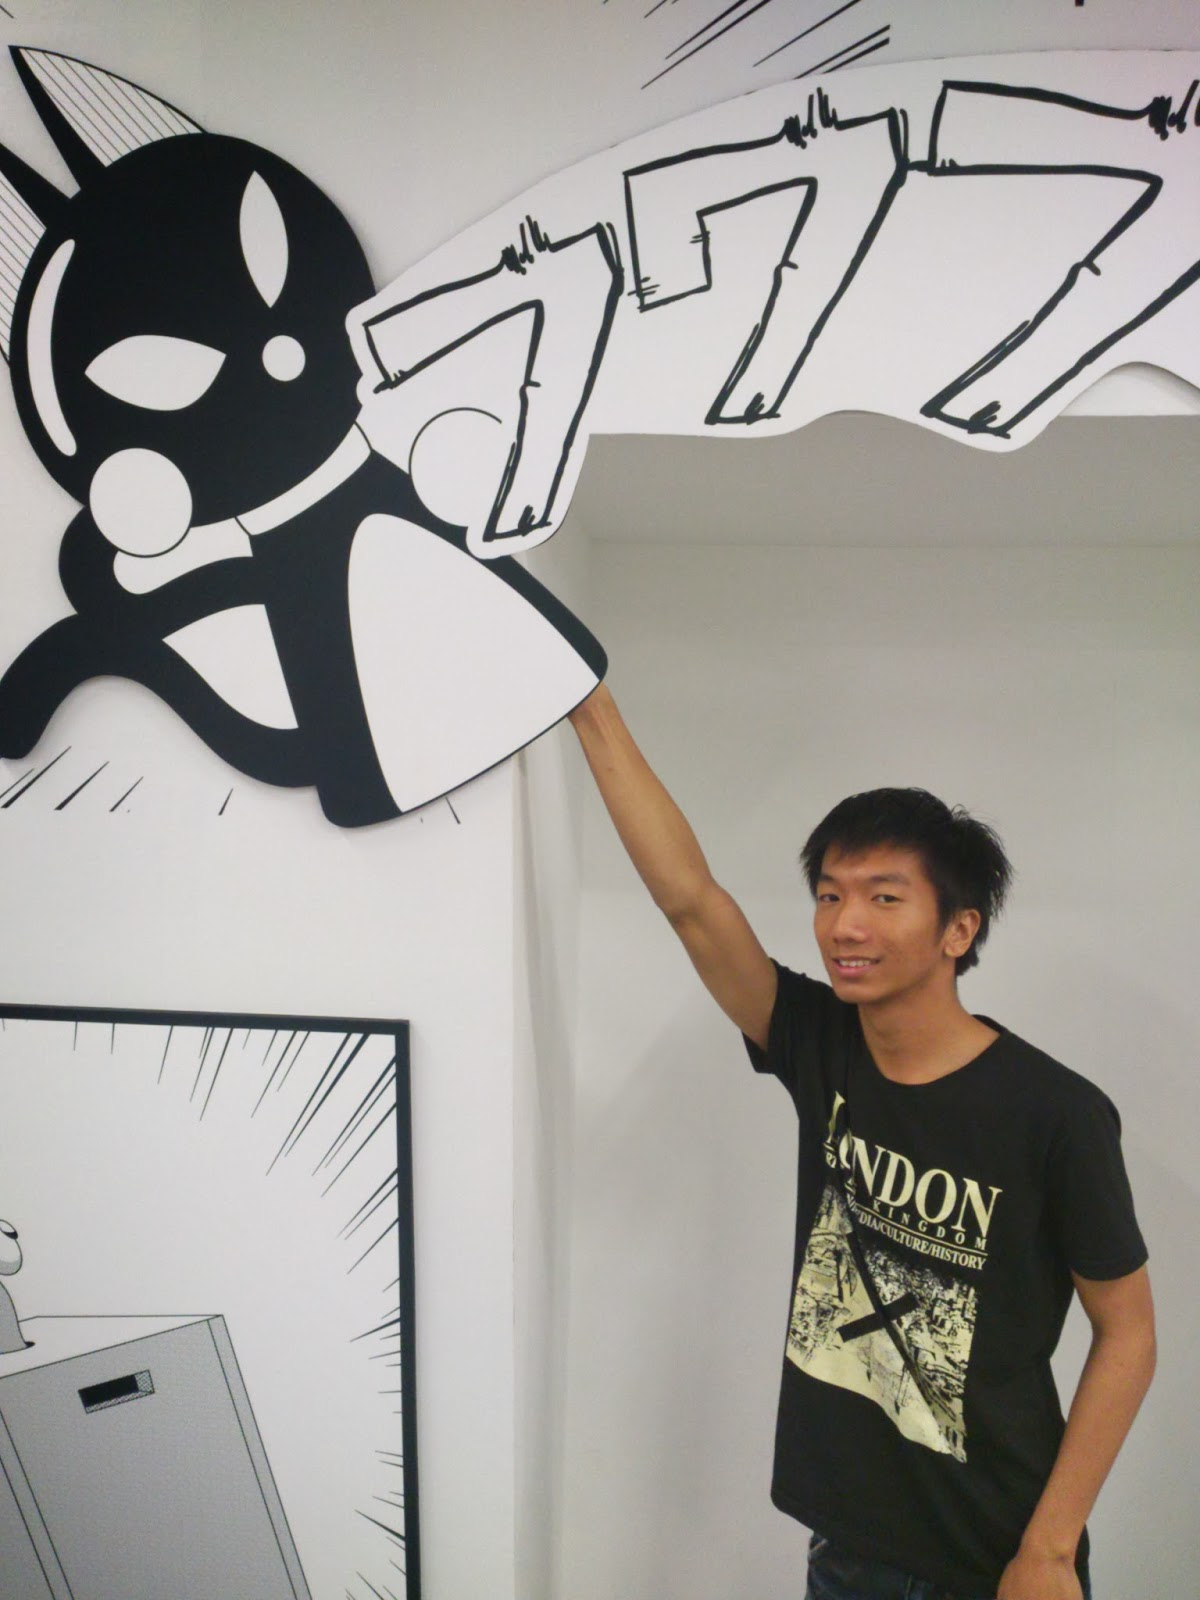 Doreamon Black&White Comics at the wall